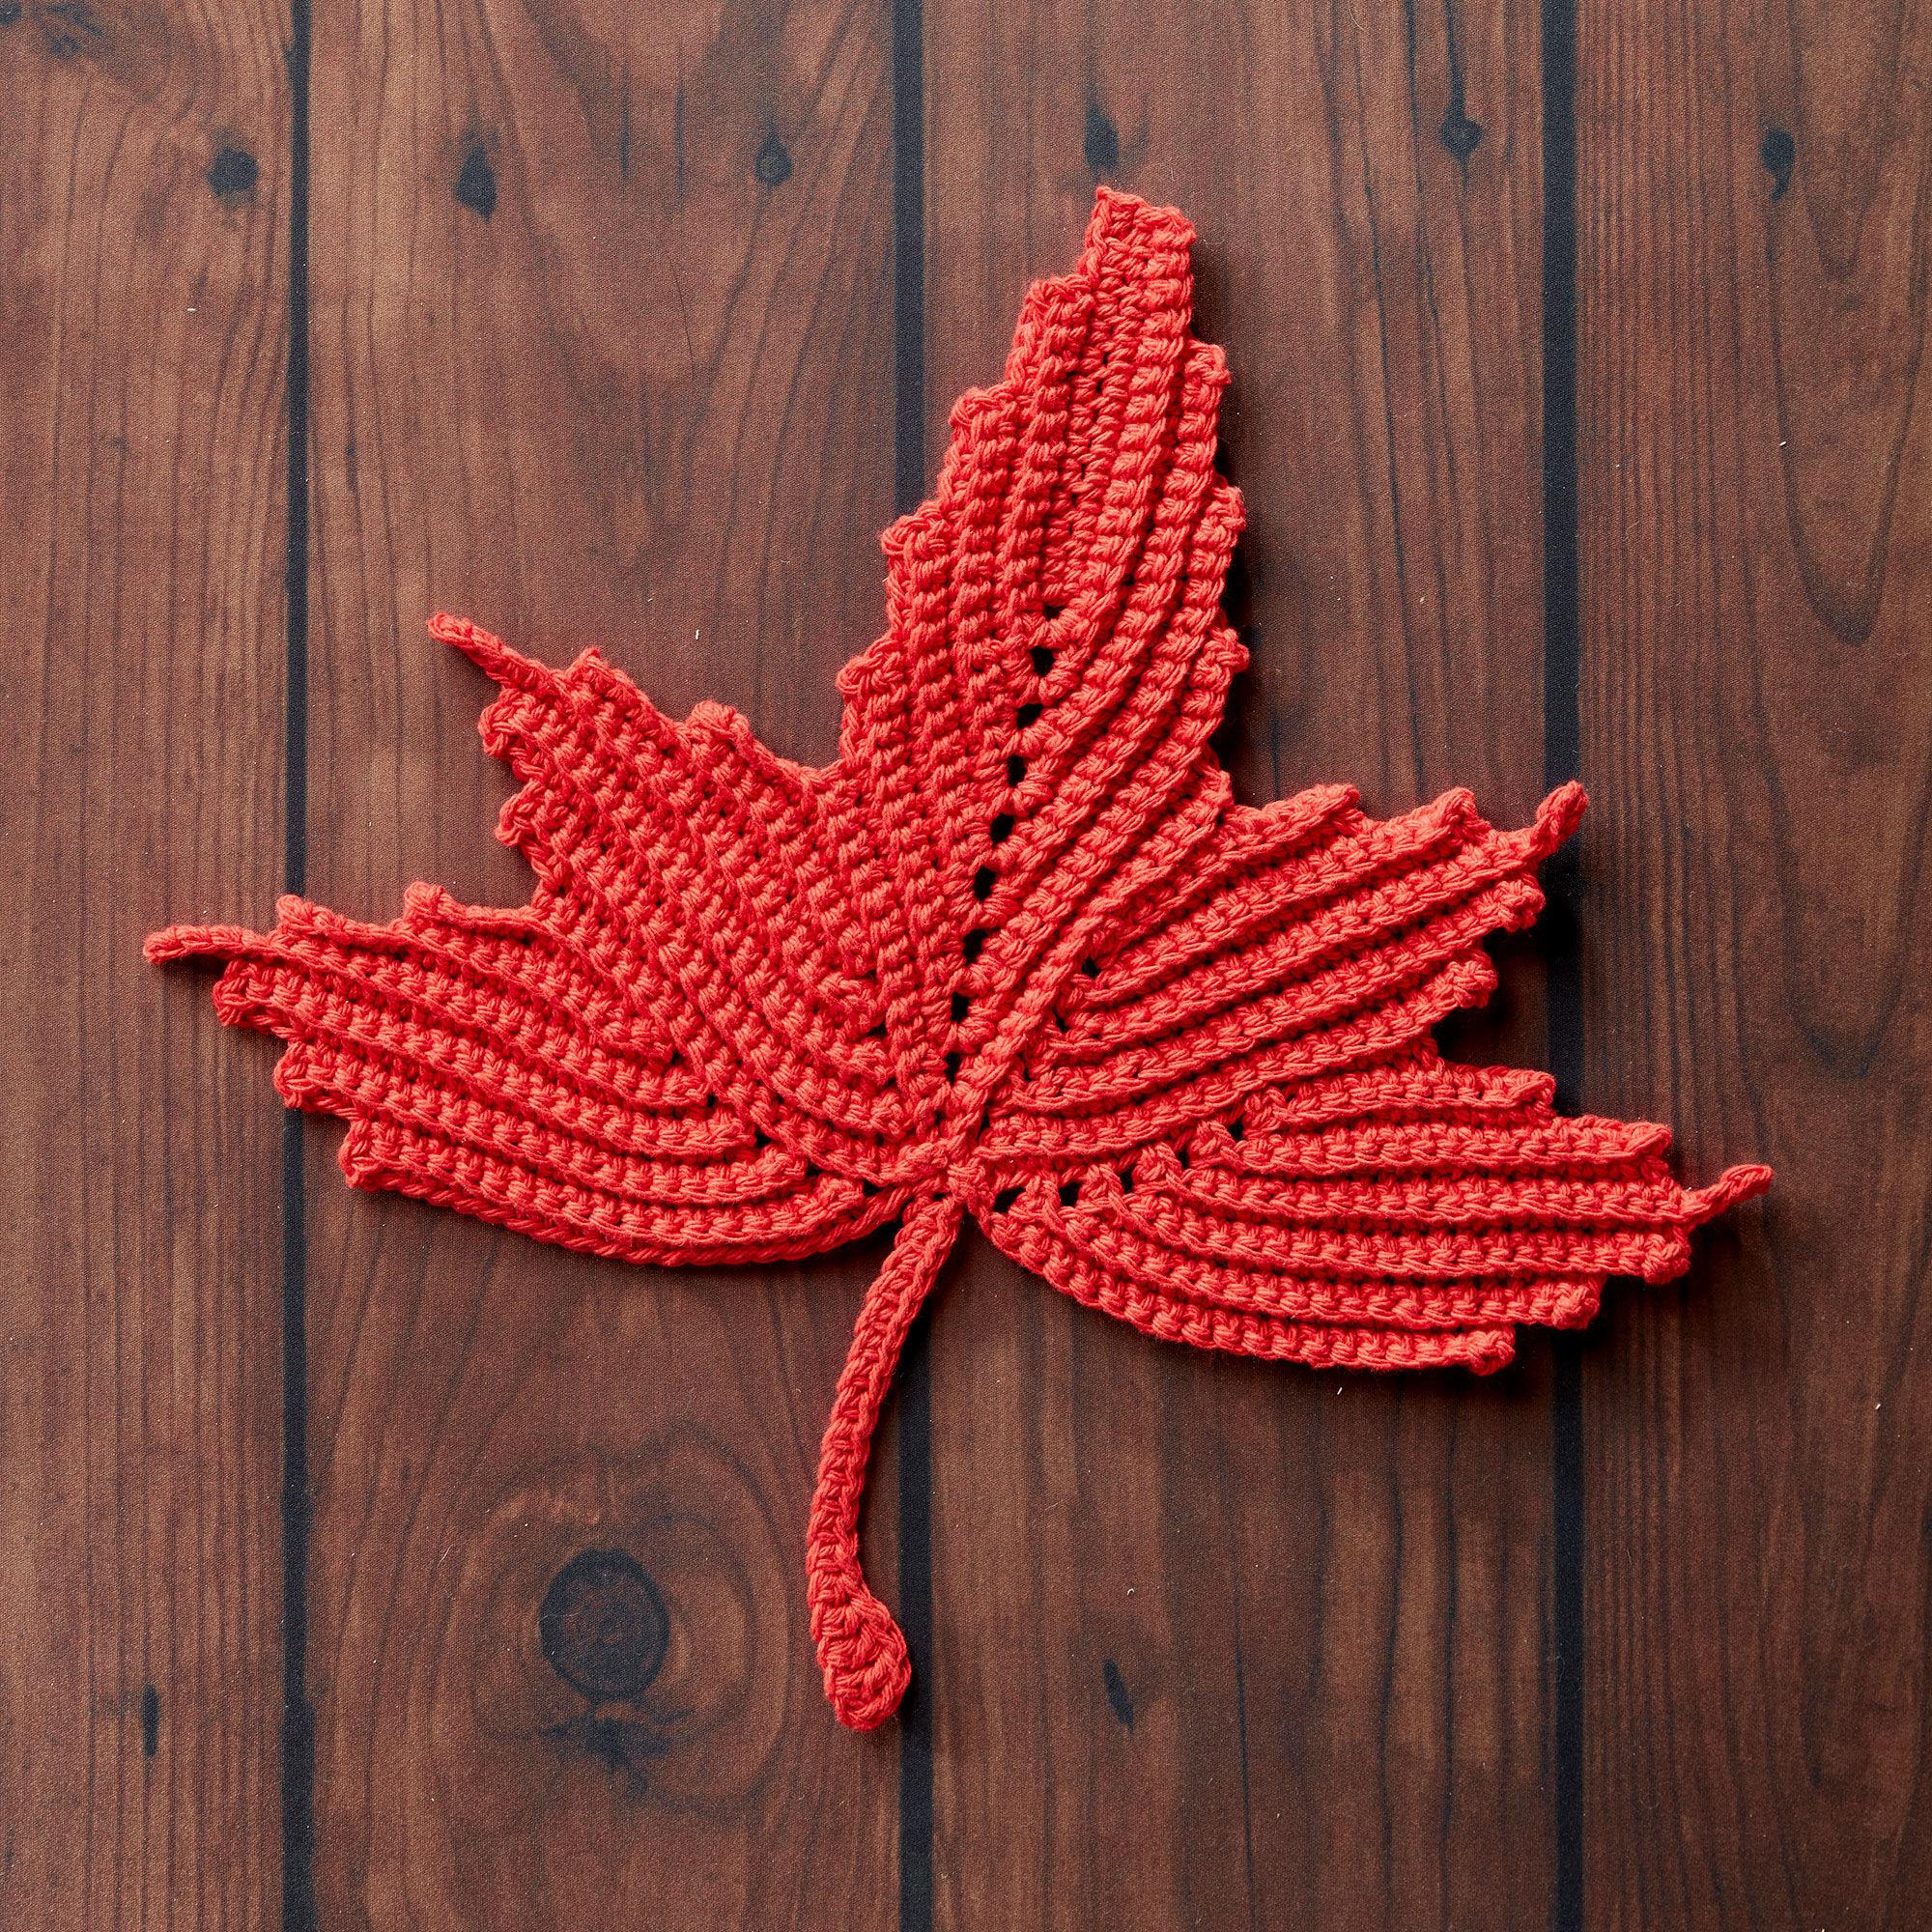 Bernat Maple Leaf Crochet Dishcloth | Yarnspirations